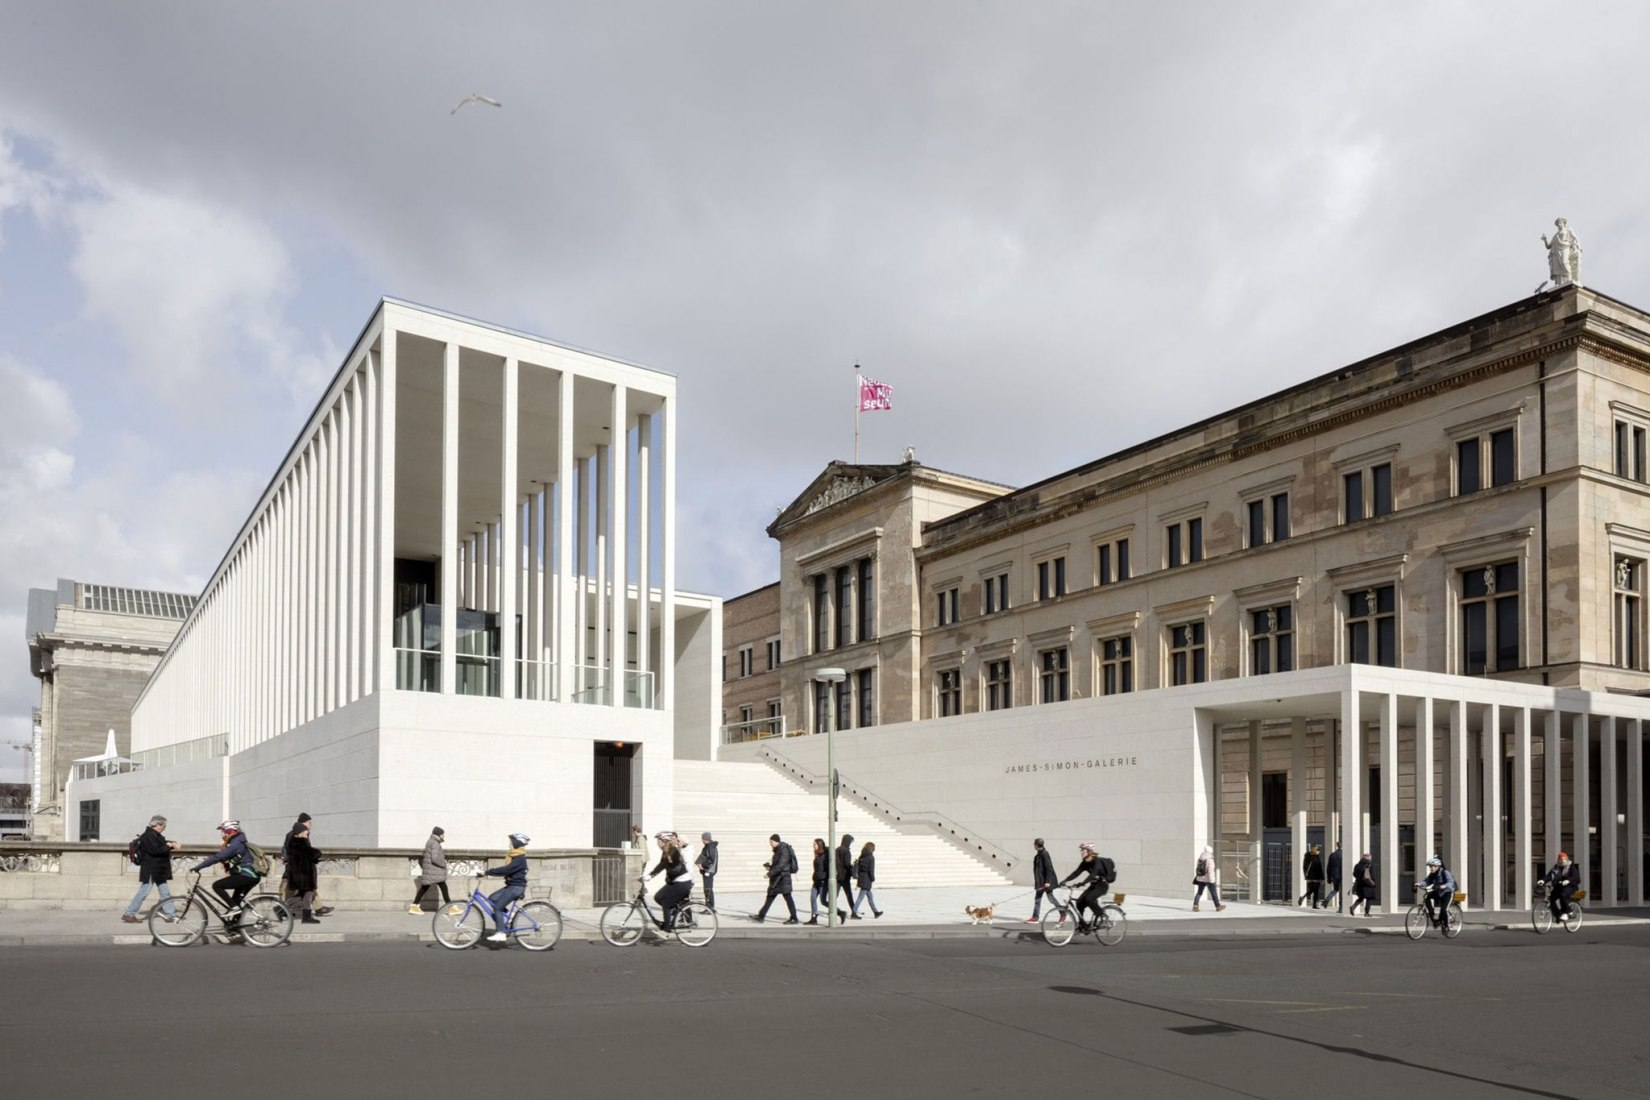 Galería James Simon de Chipperfield en Berlín. Fotografía de Ute Zscharnt.